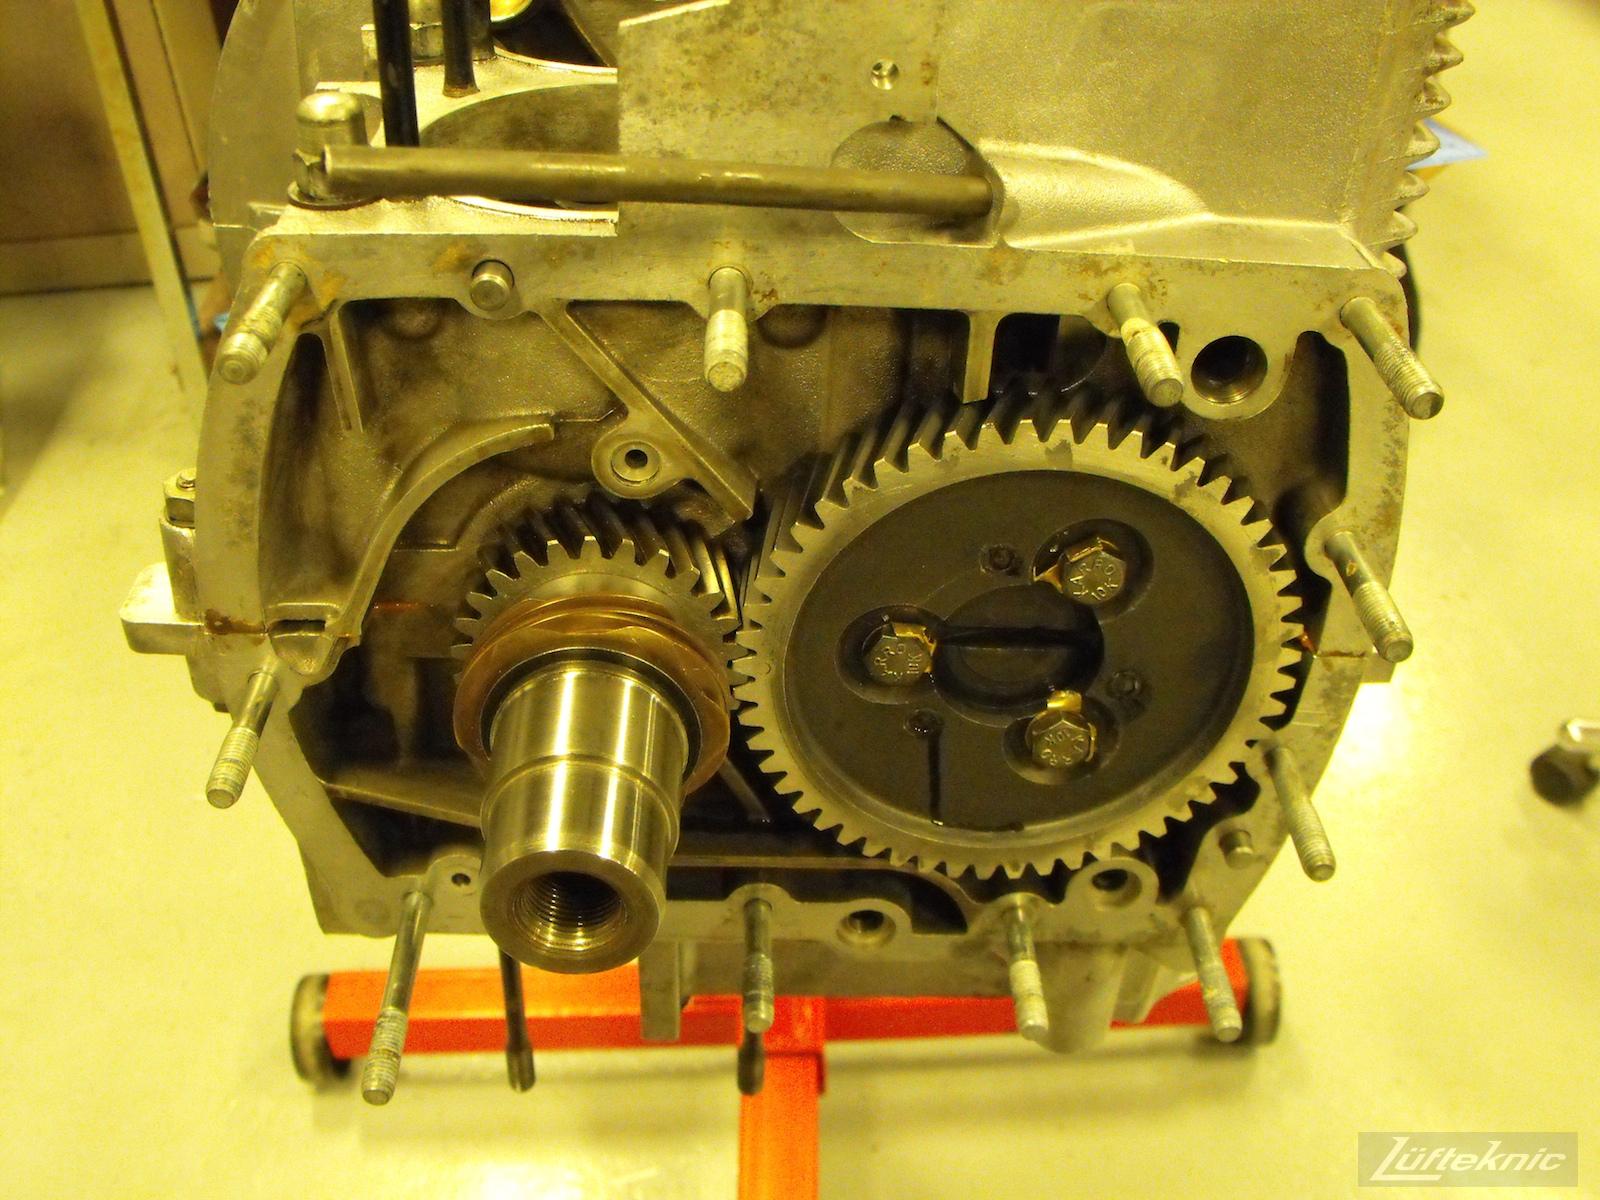 Engine assembly for a 1961 Porsche 356B Roadster restoration.